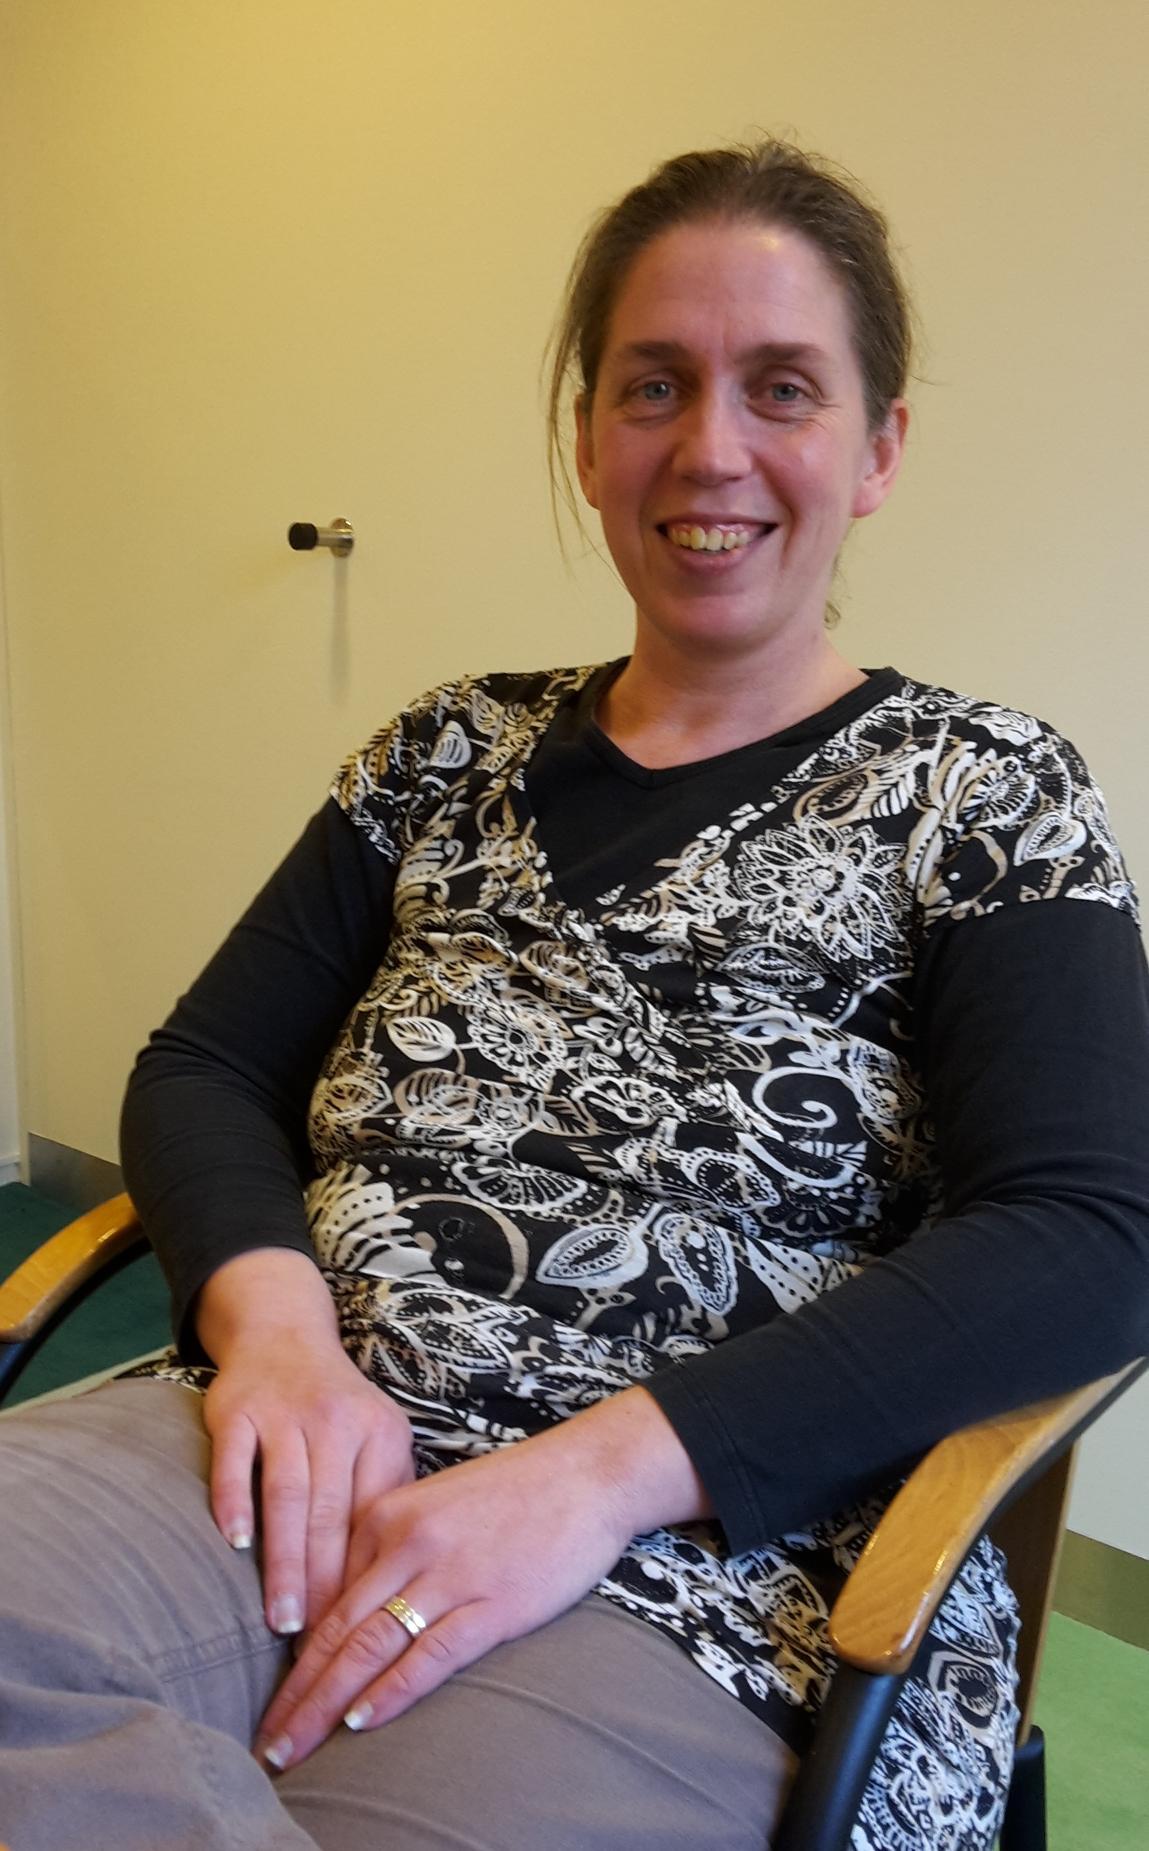 Miffa: Ingrid van der Winden